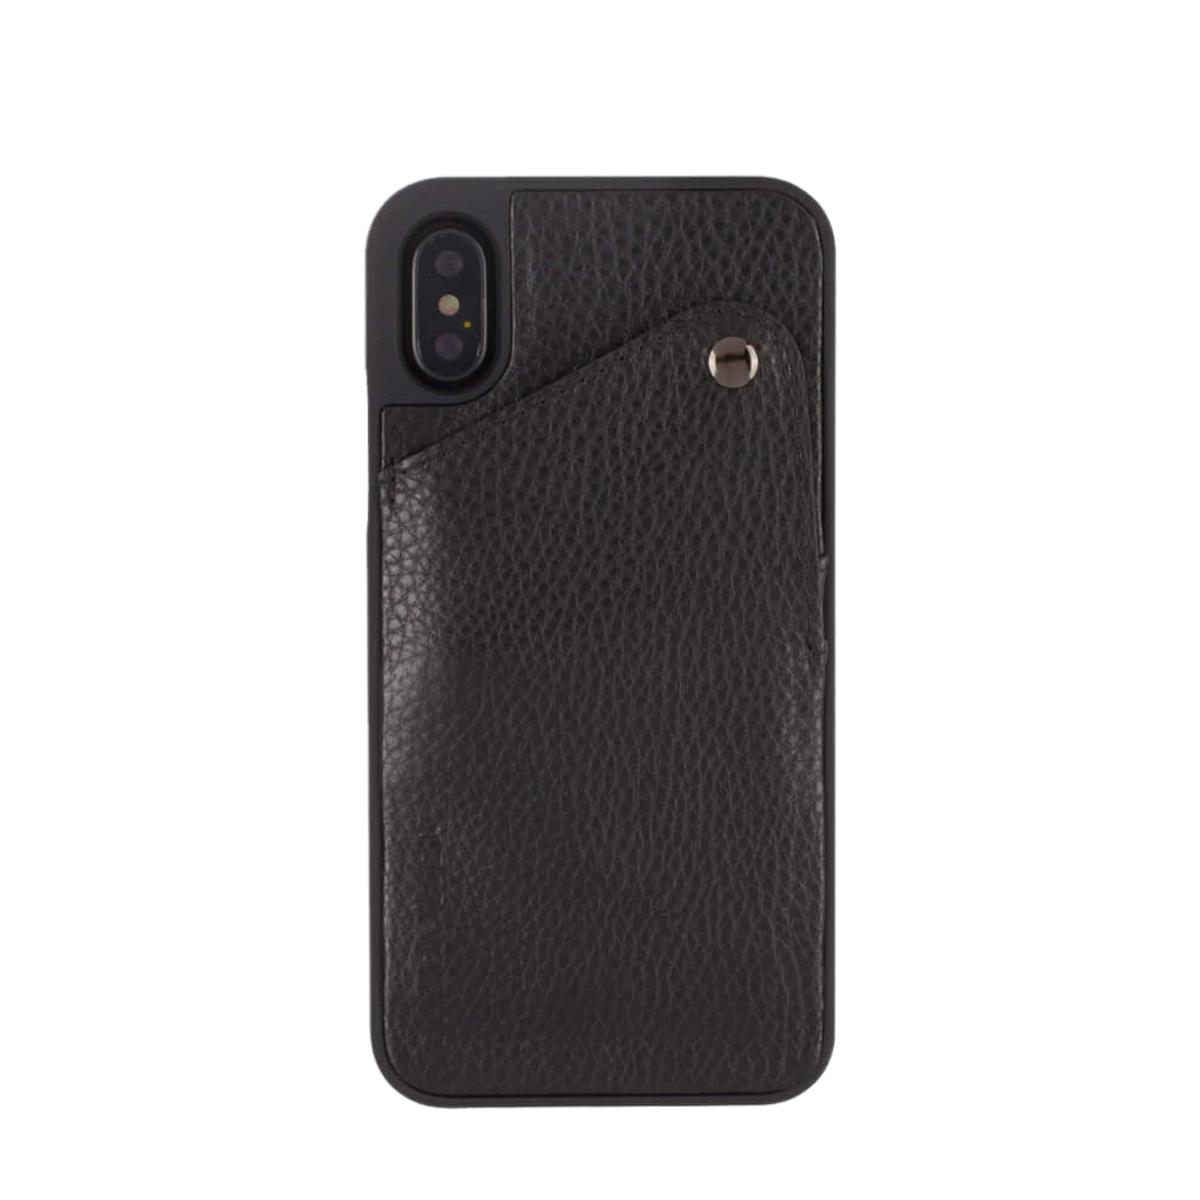 bandolier iphone 7 case